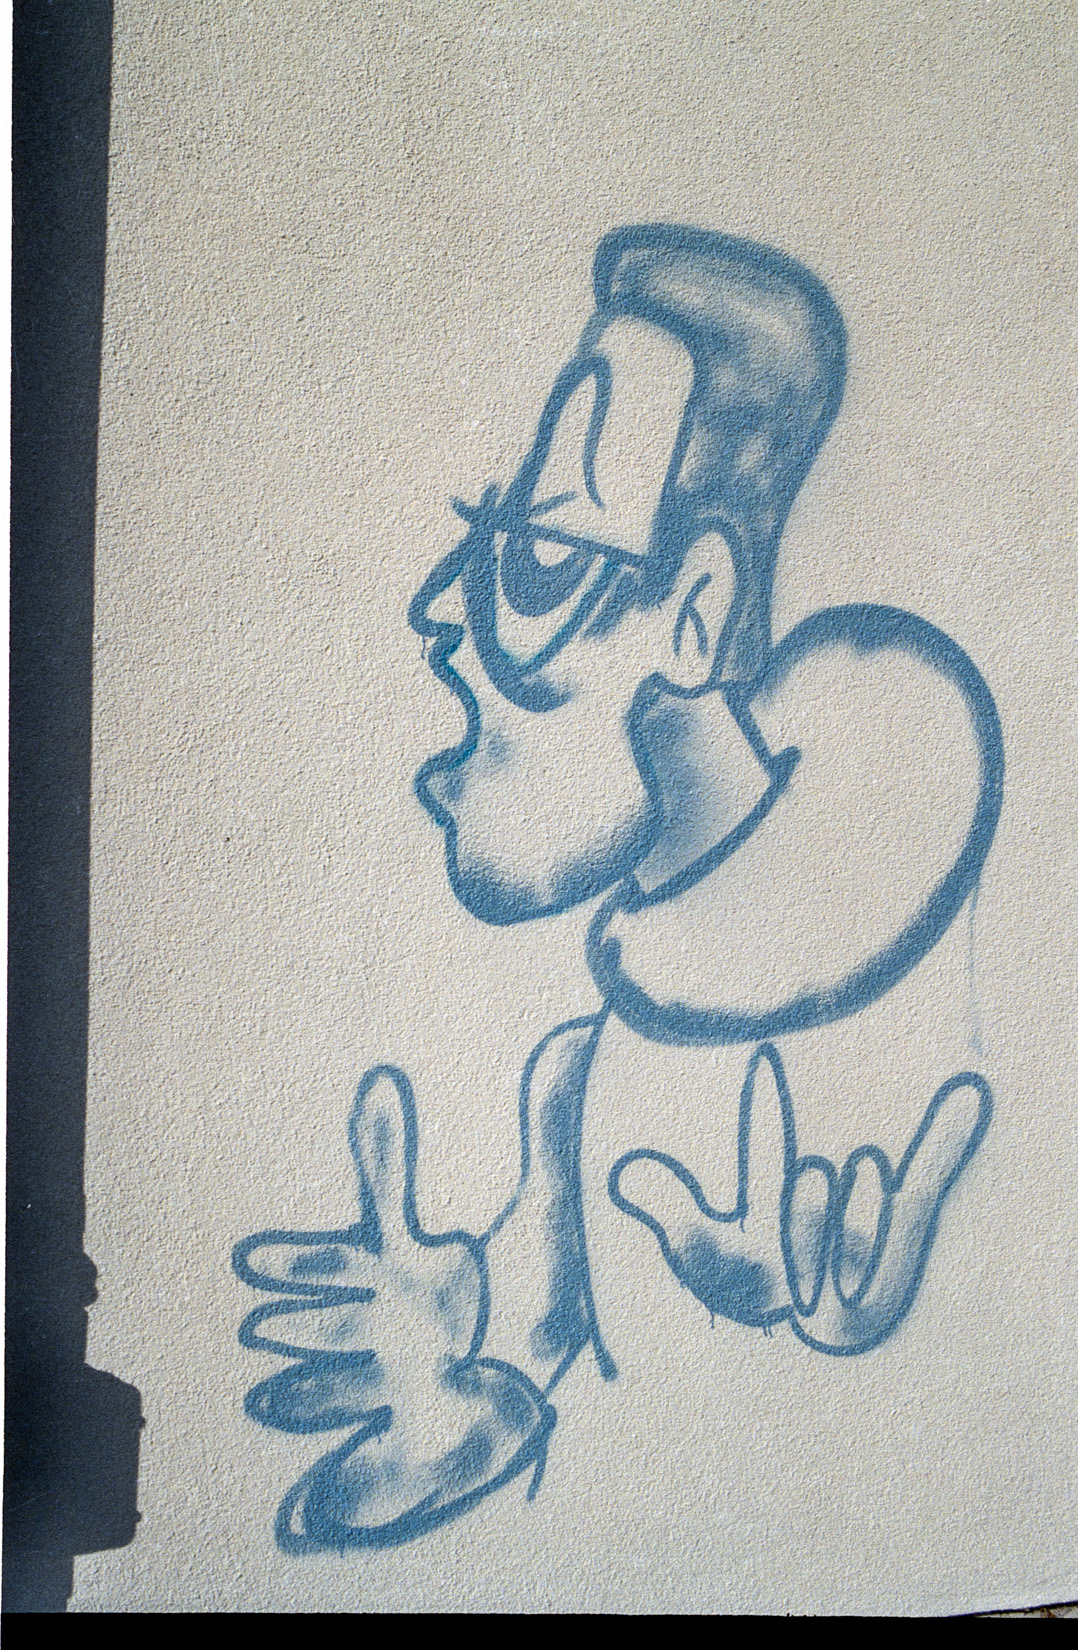 Frankfurt_Graffiti_1988_1989_H88_FRC (15 von 25)